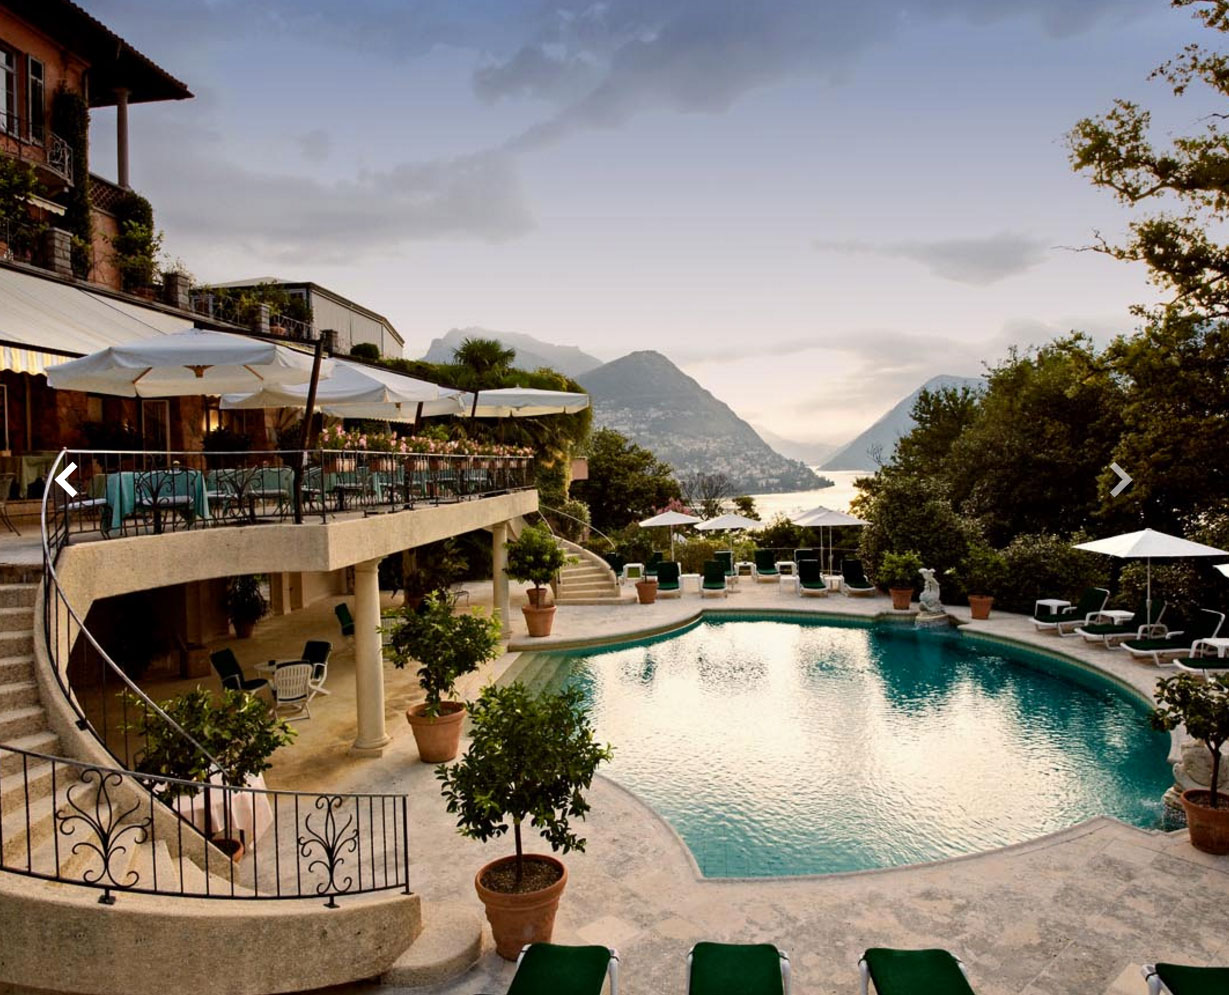 Hotel Leopoldo, Switzerland